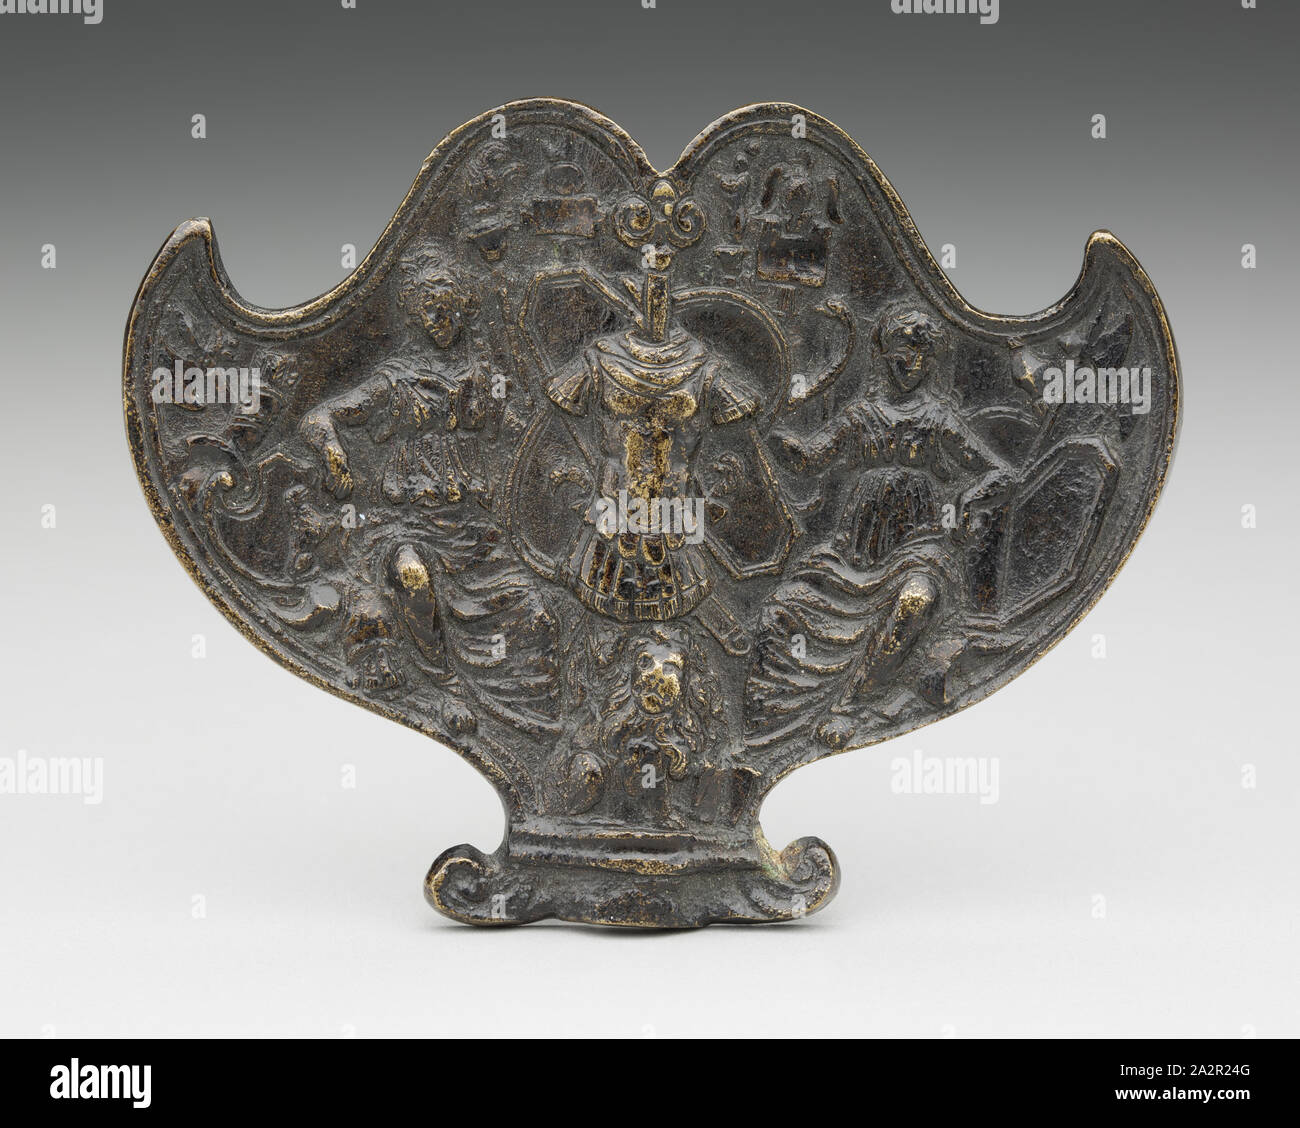 Escultura fútbol jugador Antik-estilo bronce personaje moderna trofeo trofeo